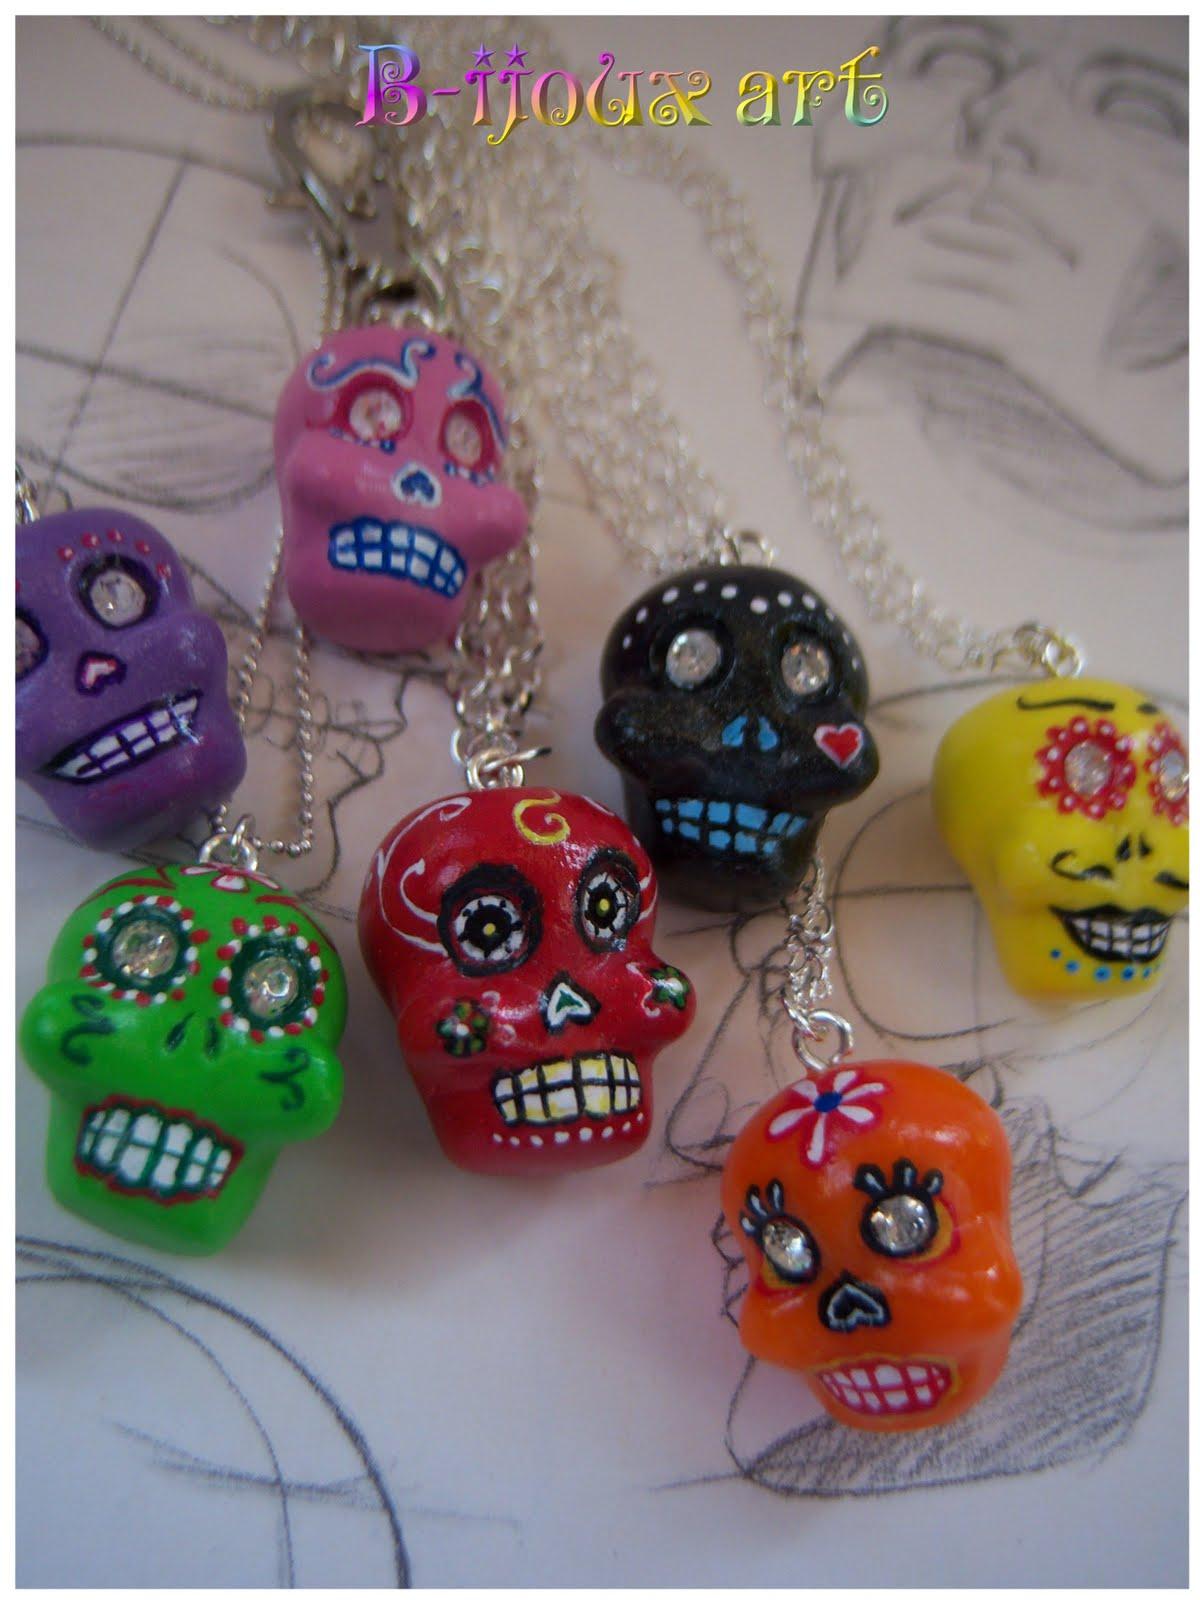 http://1.bp.blogspot.com/-sjNFIzHOsB4/TdZEnou-5CI/AAAAAAAABe0/LO3PNg3bfs0/s1600/teschi+messicani+colorati.JPG